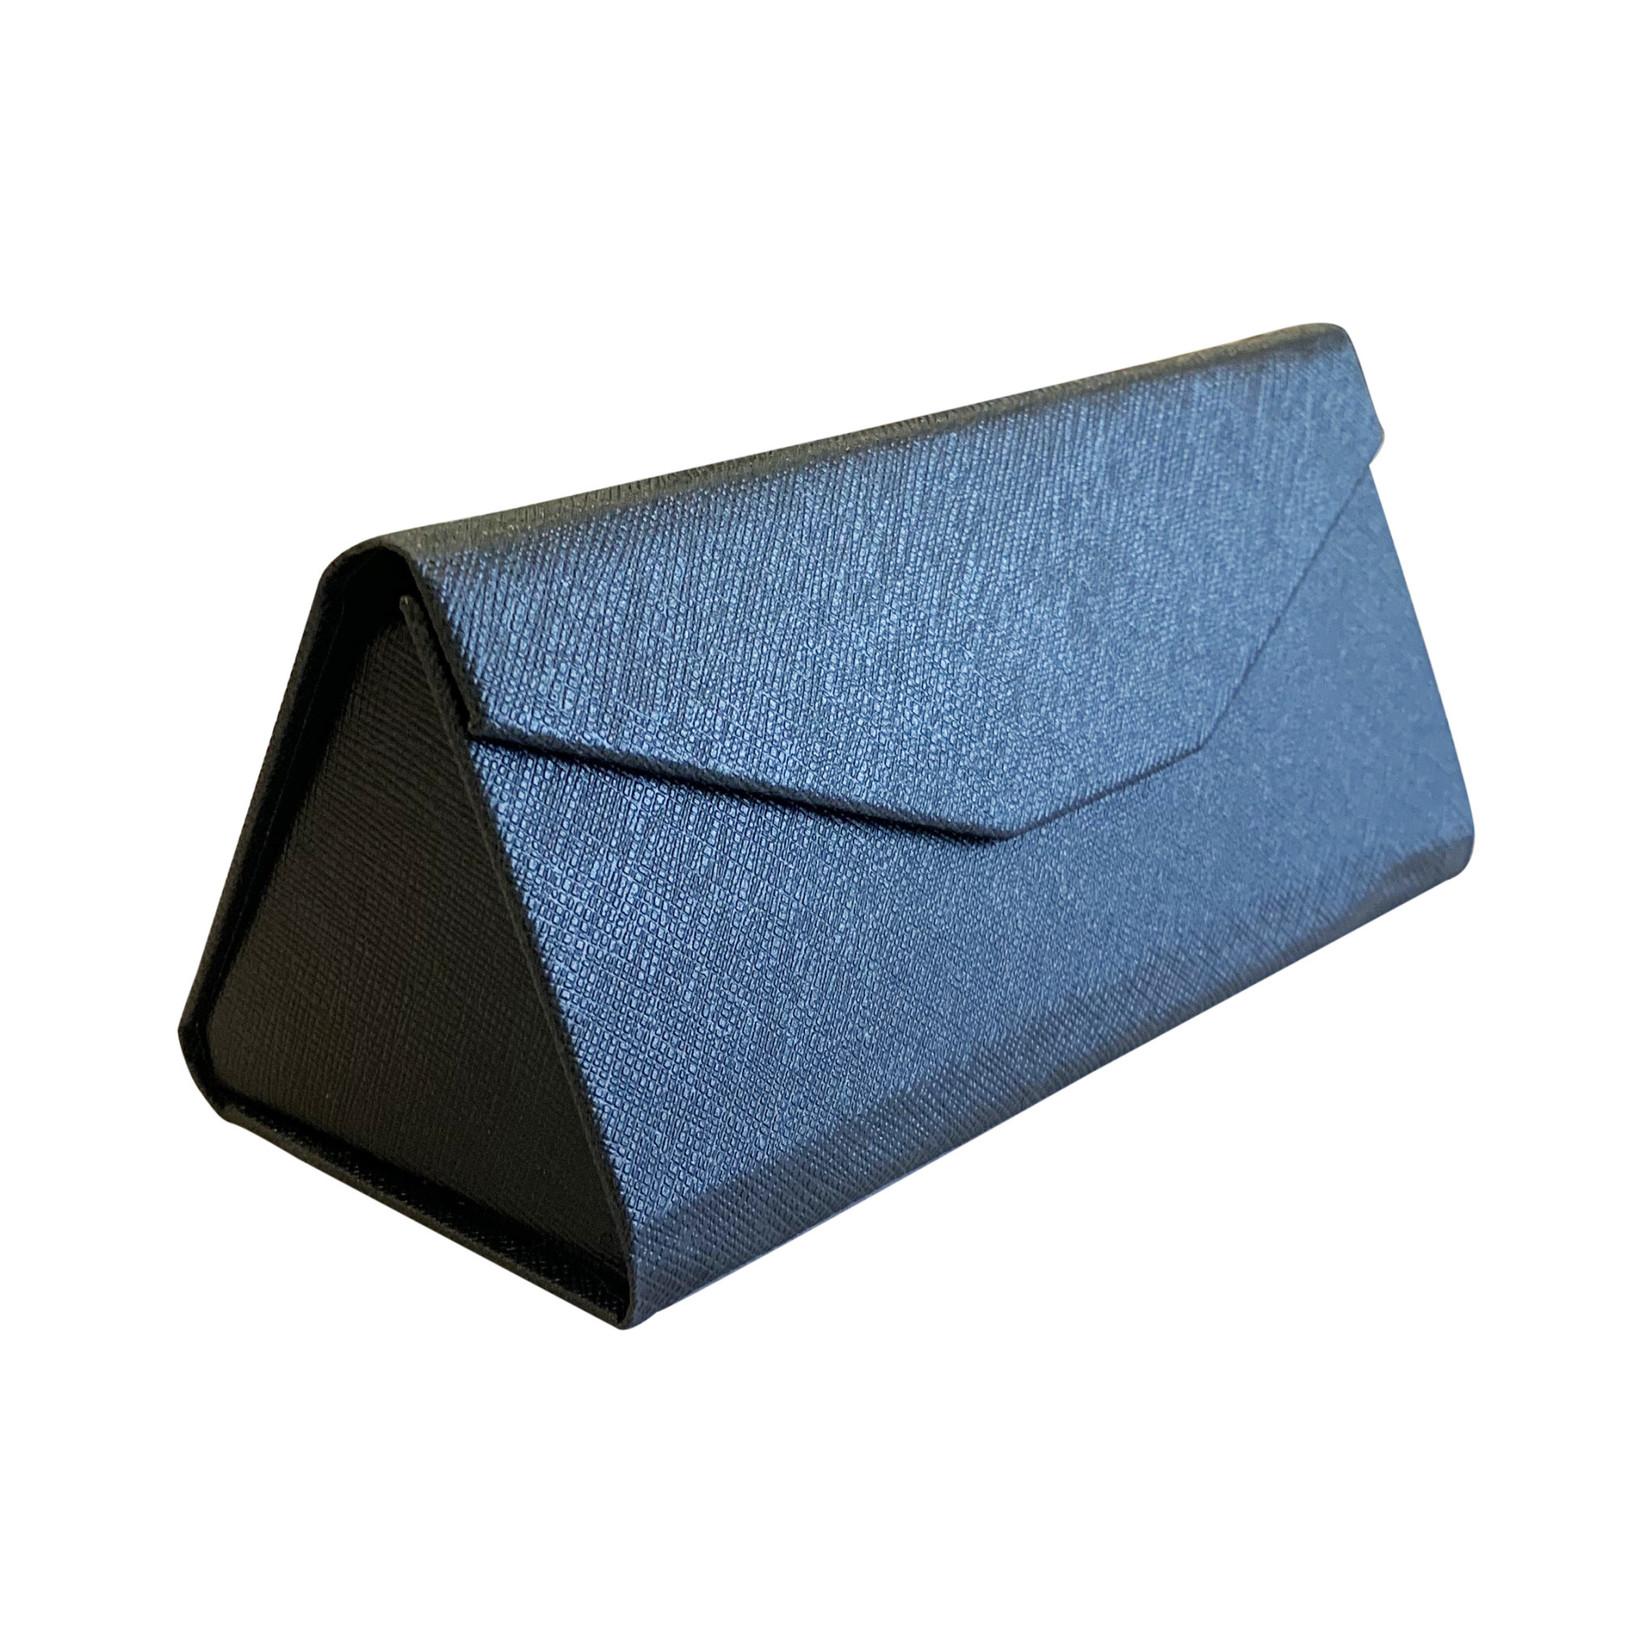 Wyld Blue Black Triangle Sunglass Case